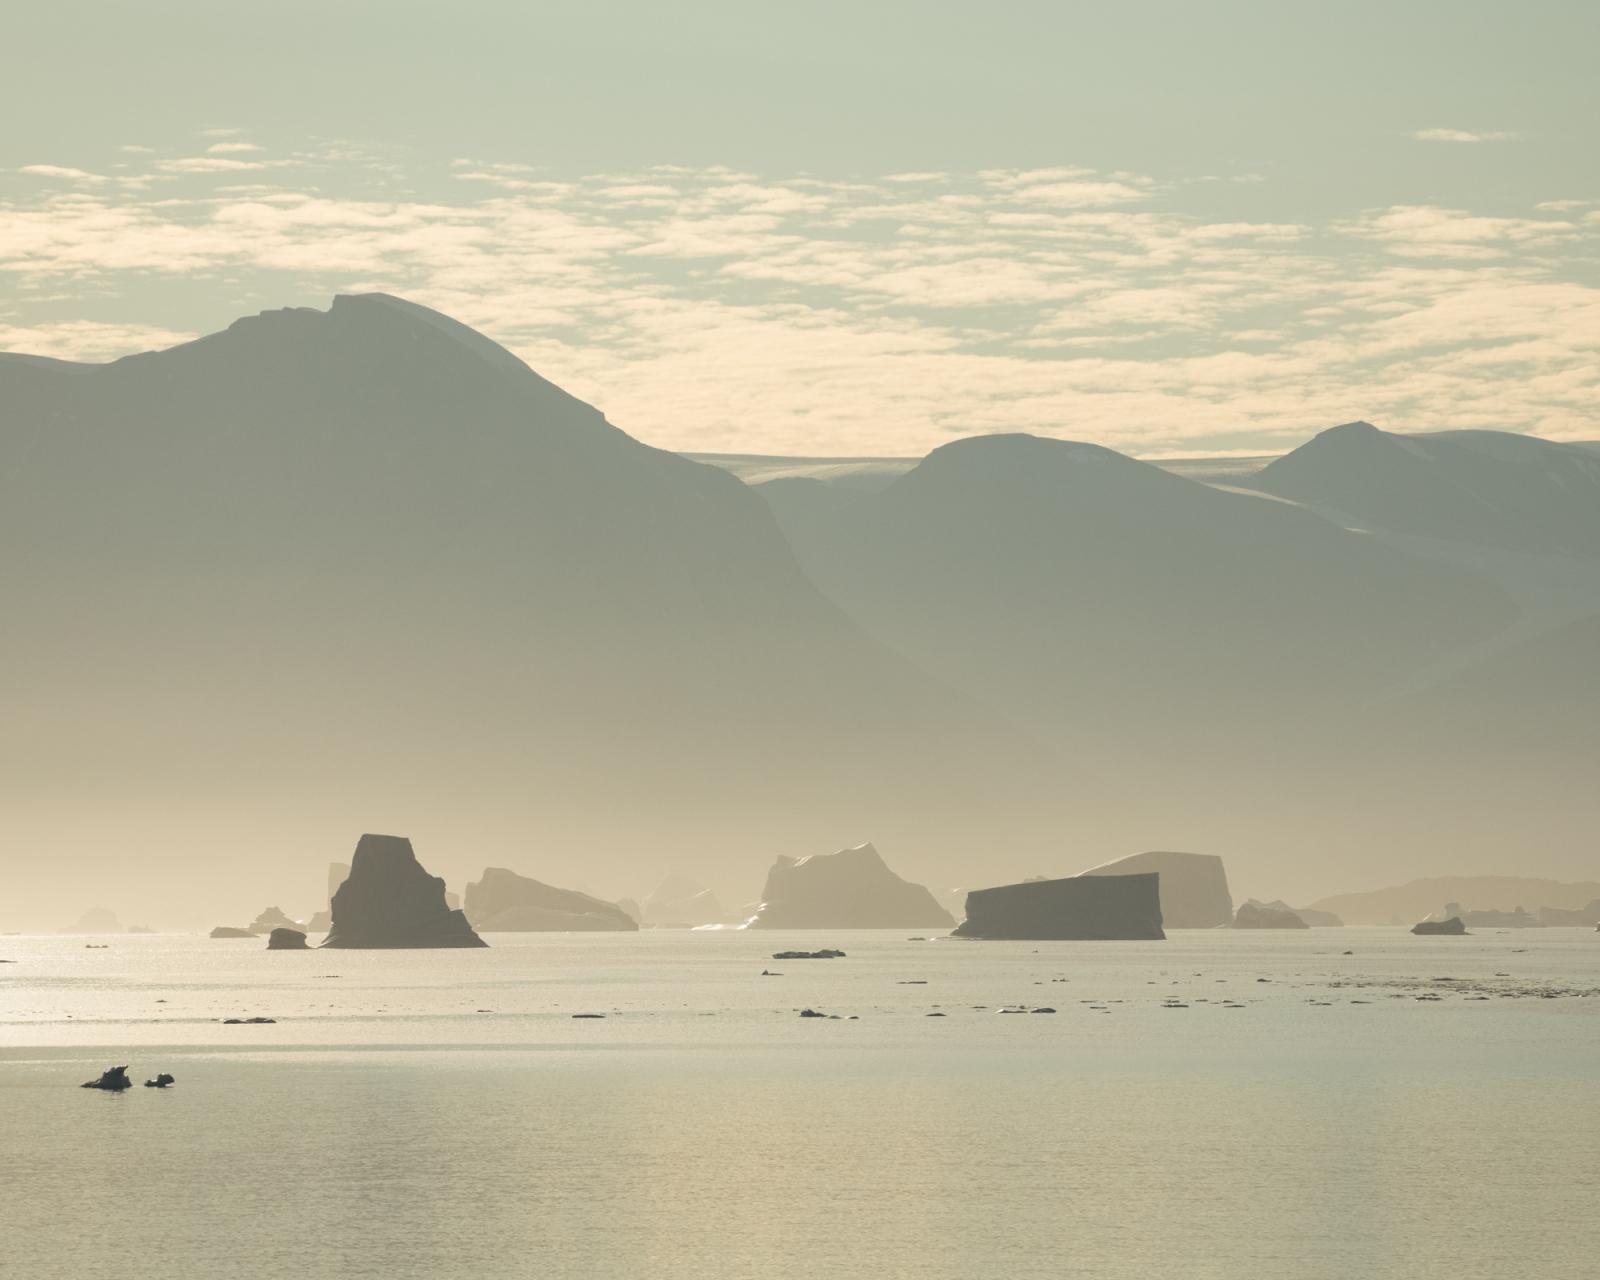 Scoresbysund, East Greenland, 2016.